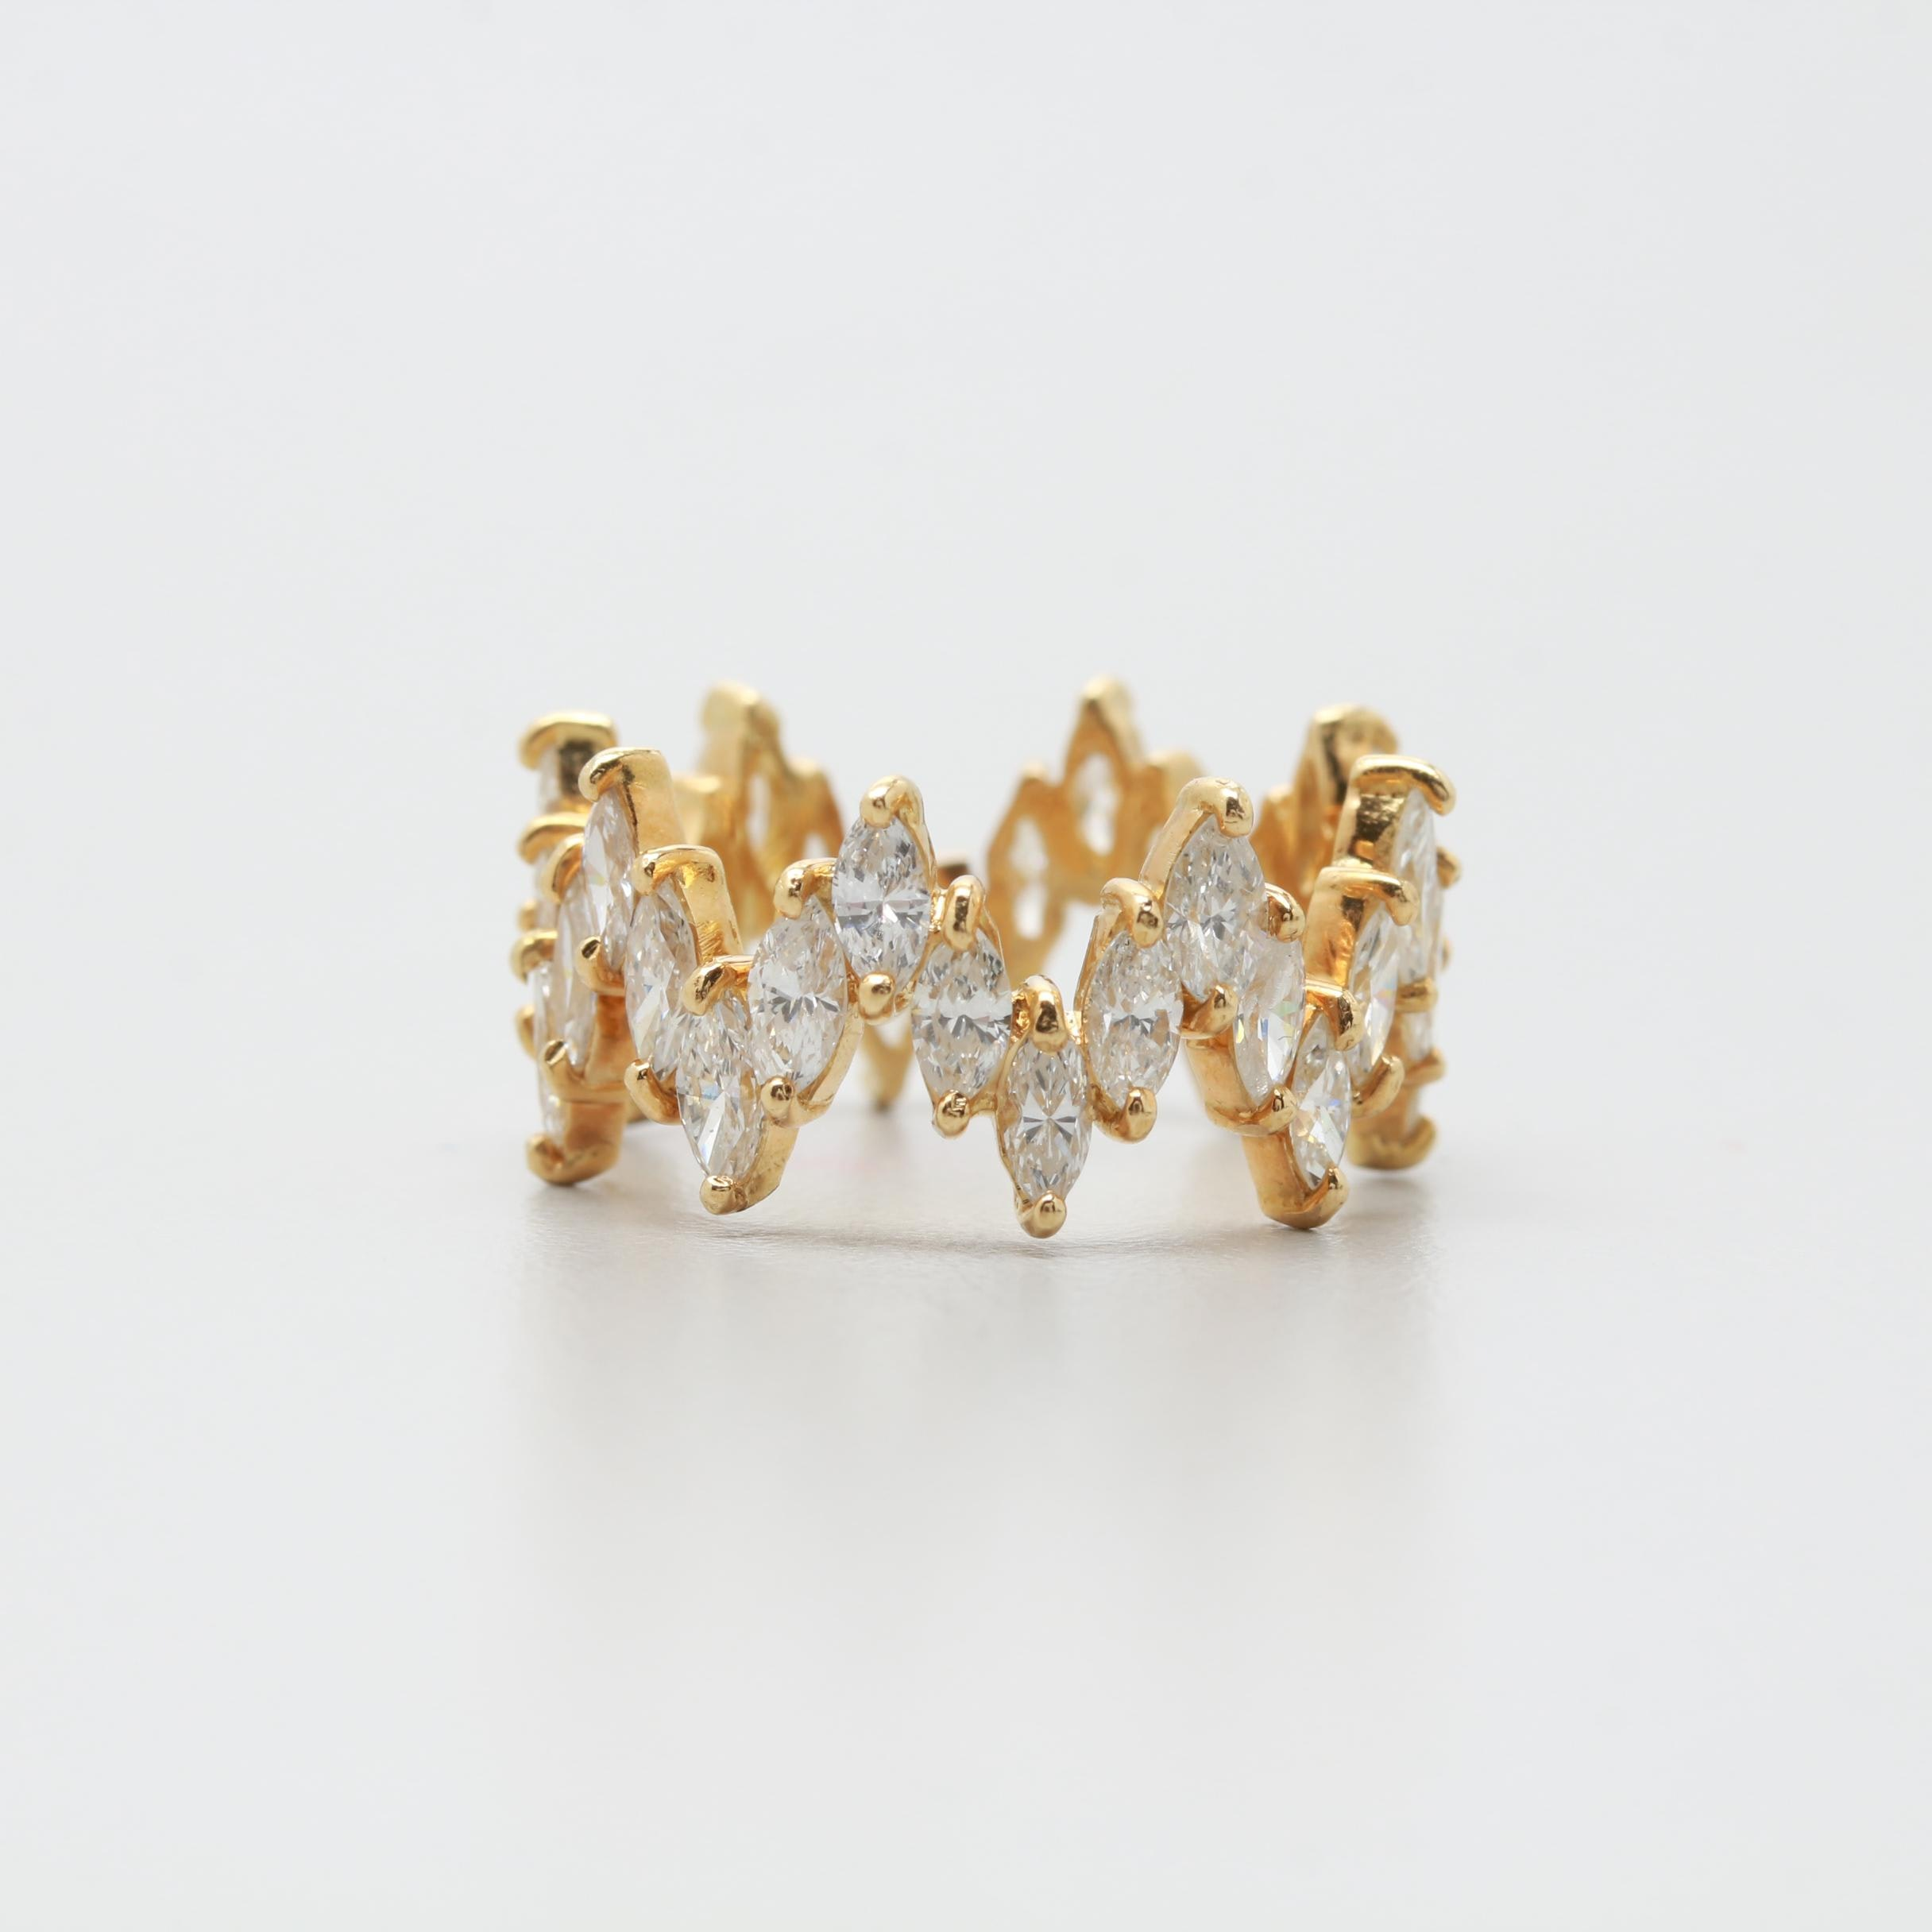 18K Yellow Gold 4.96 CTW Diamond Ring